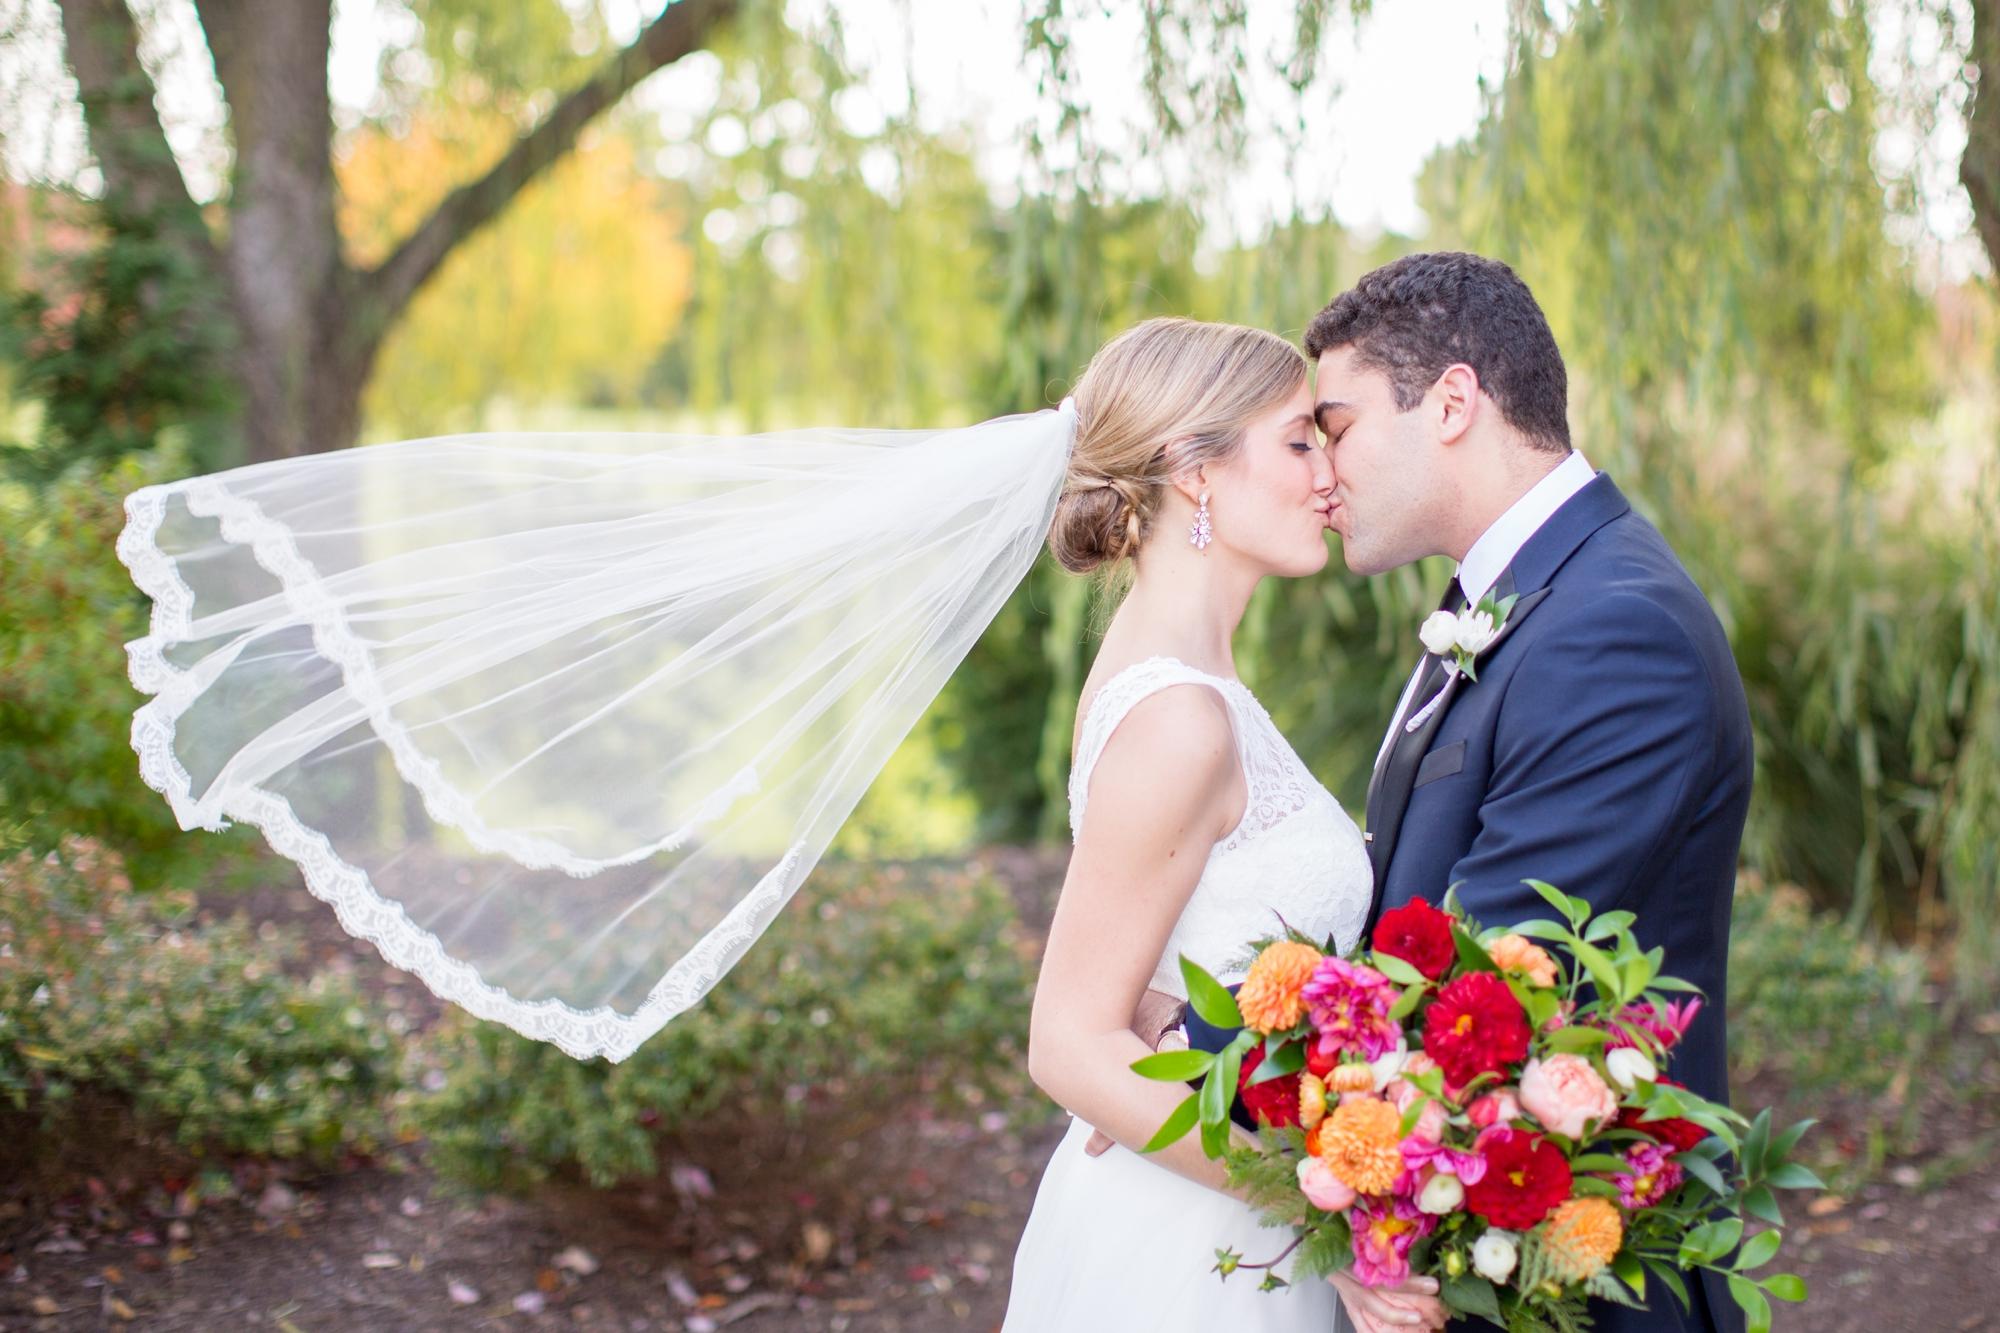 2-Finkel Wedding Bride & Groom Portraits-240_anna grace photography maryland wedding photographer turf valley.jpg